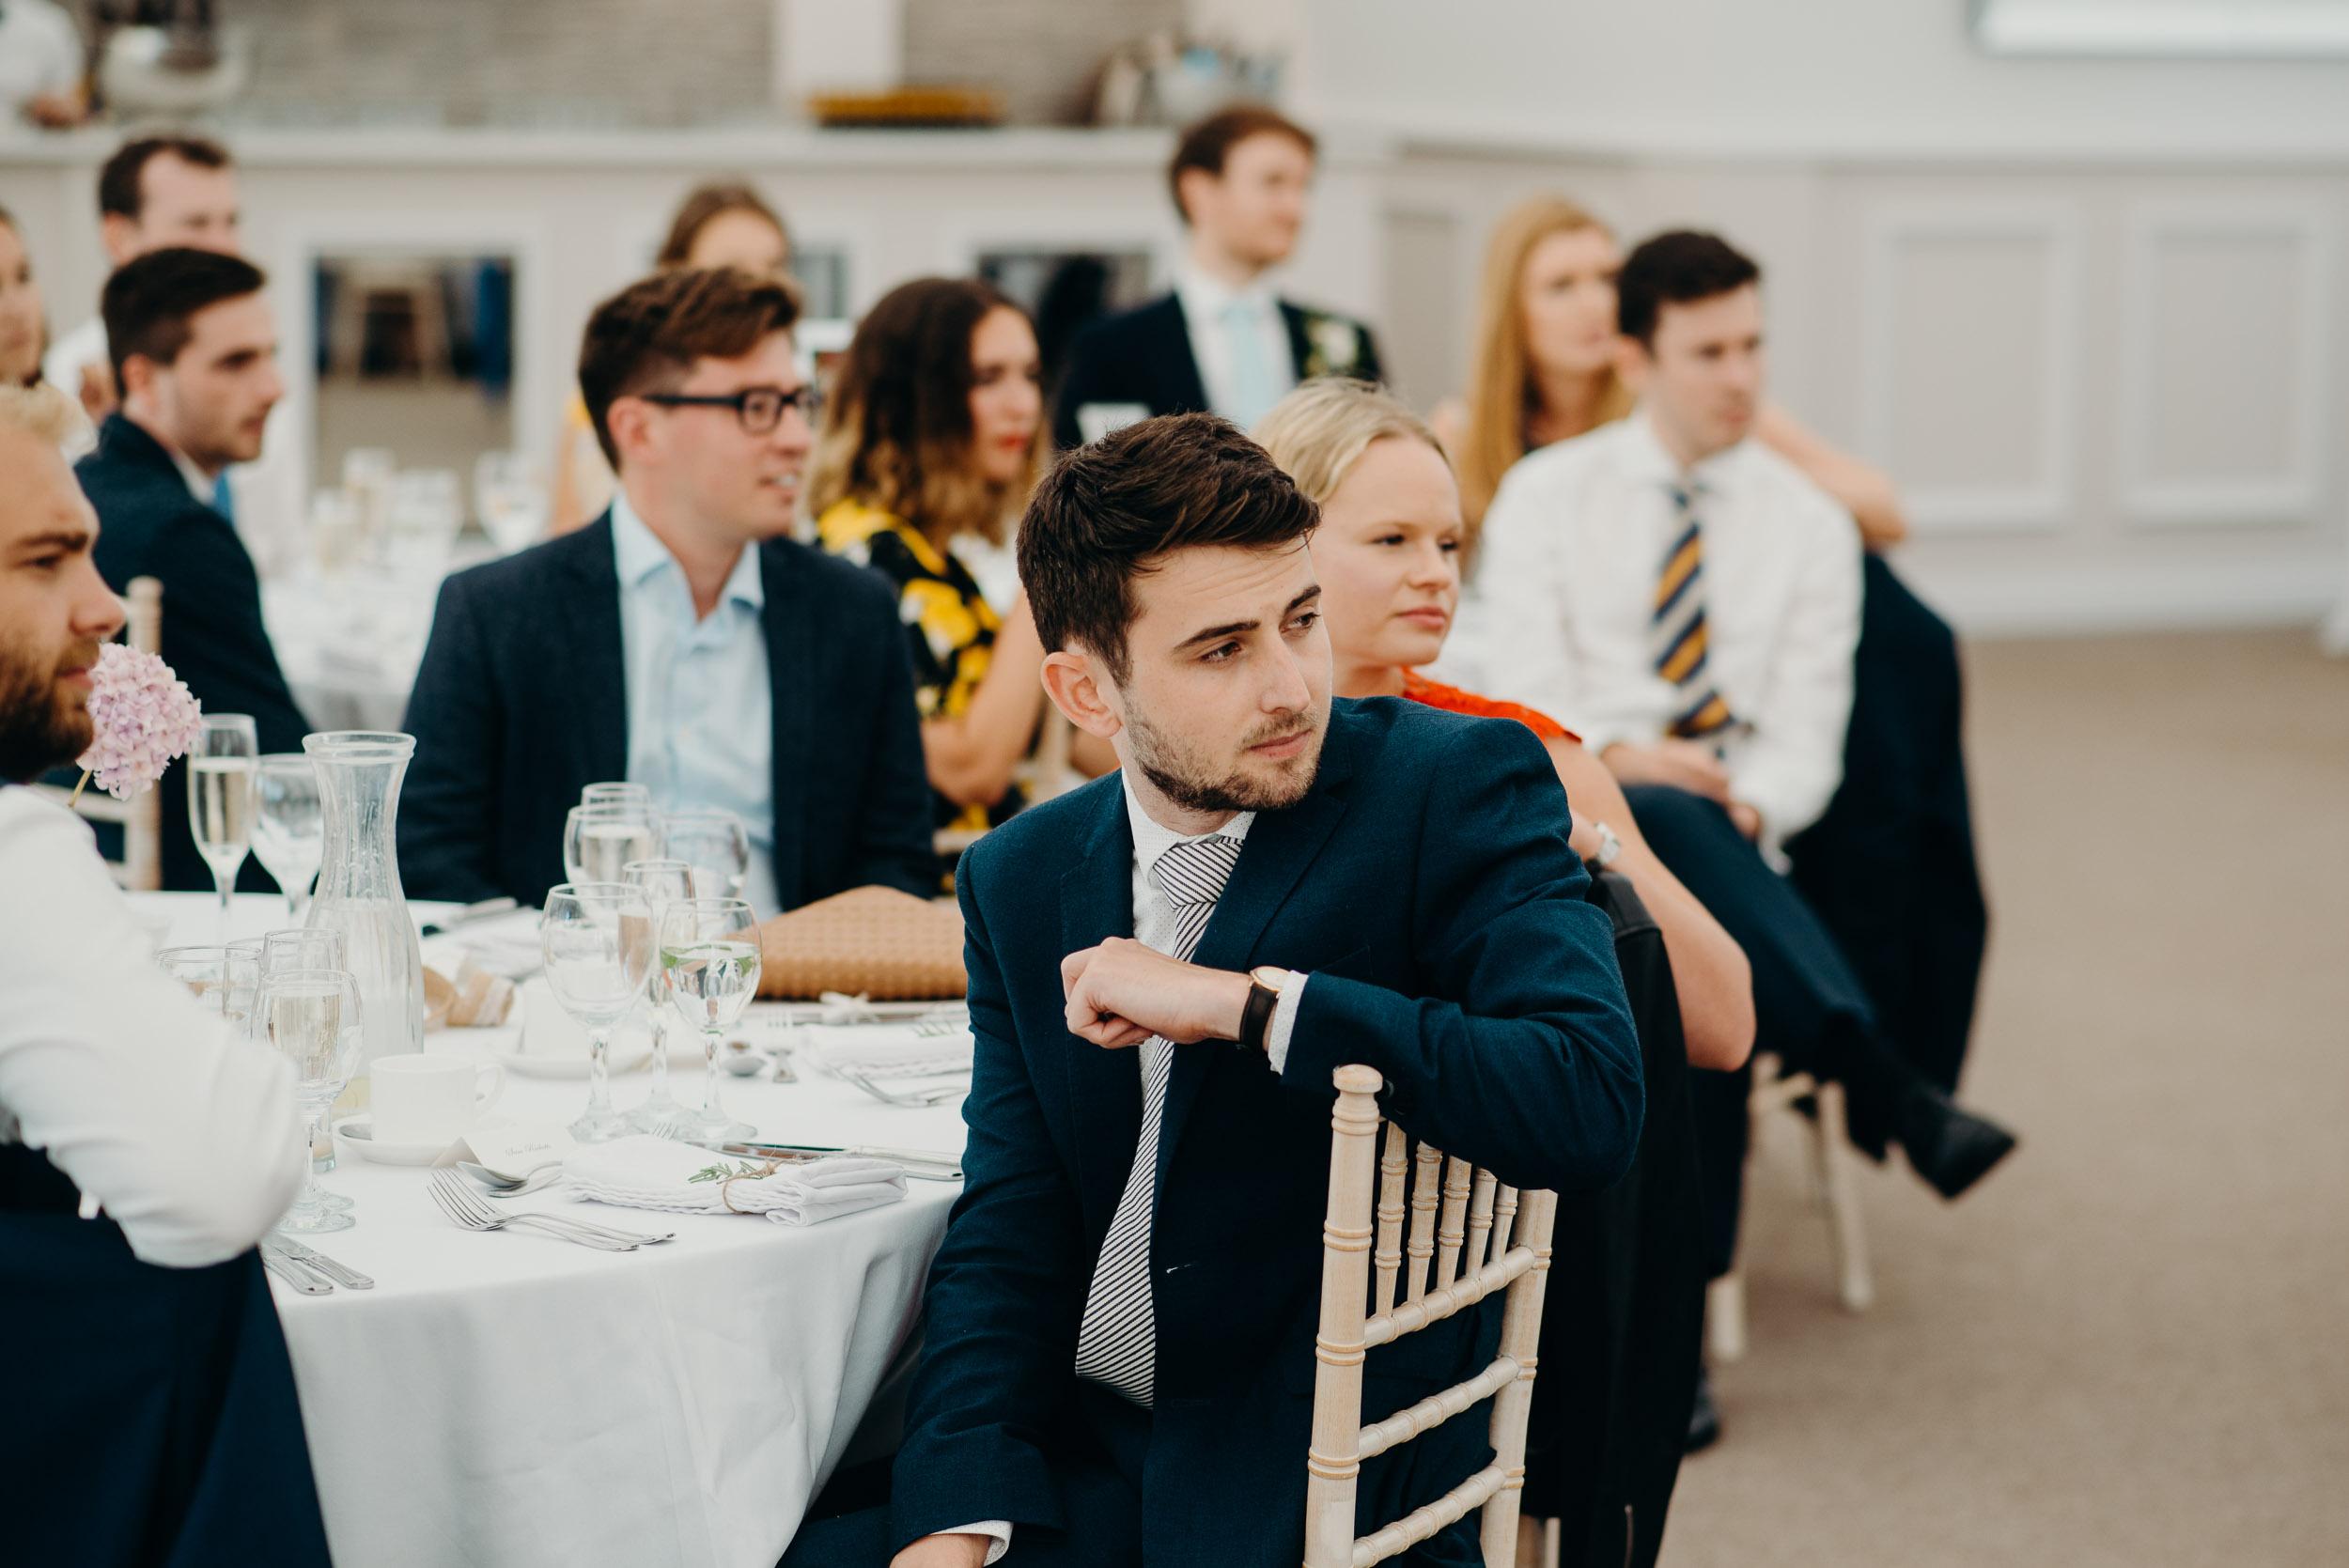 drenagh estate wedding photography-107.jpg